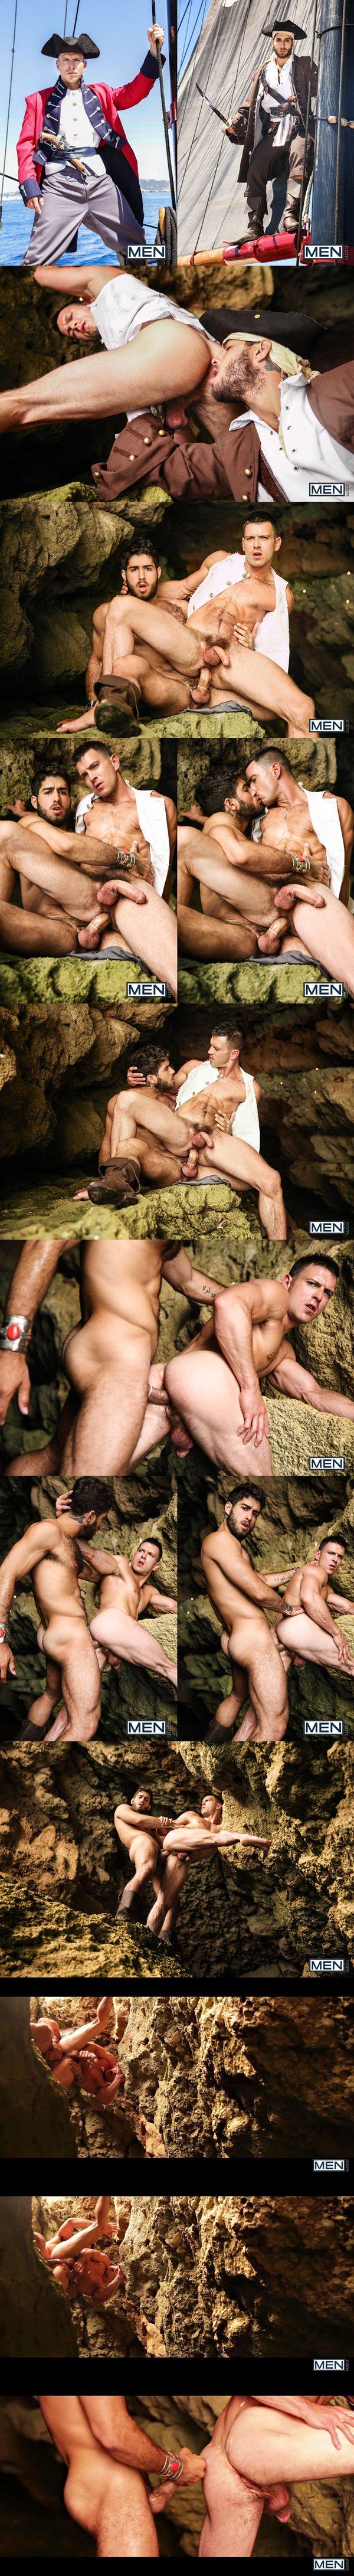 Diego Sans fucks Paddy O'Brian in Pirates A Gay XXX Parody Part 4 at Men 02